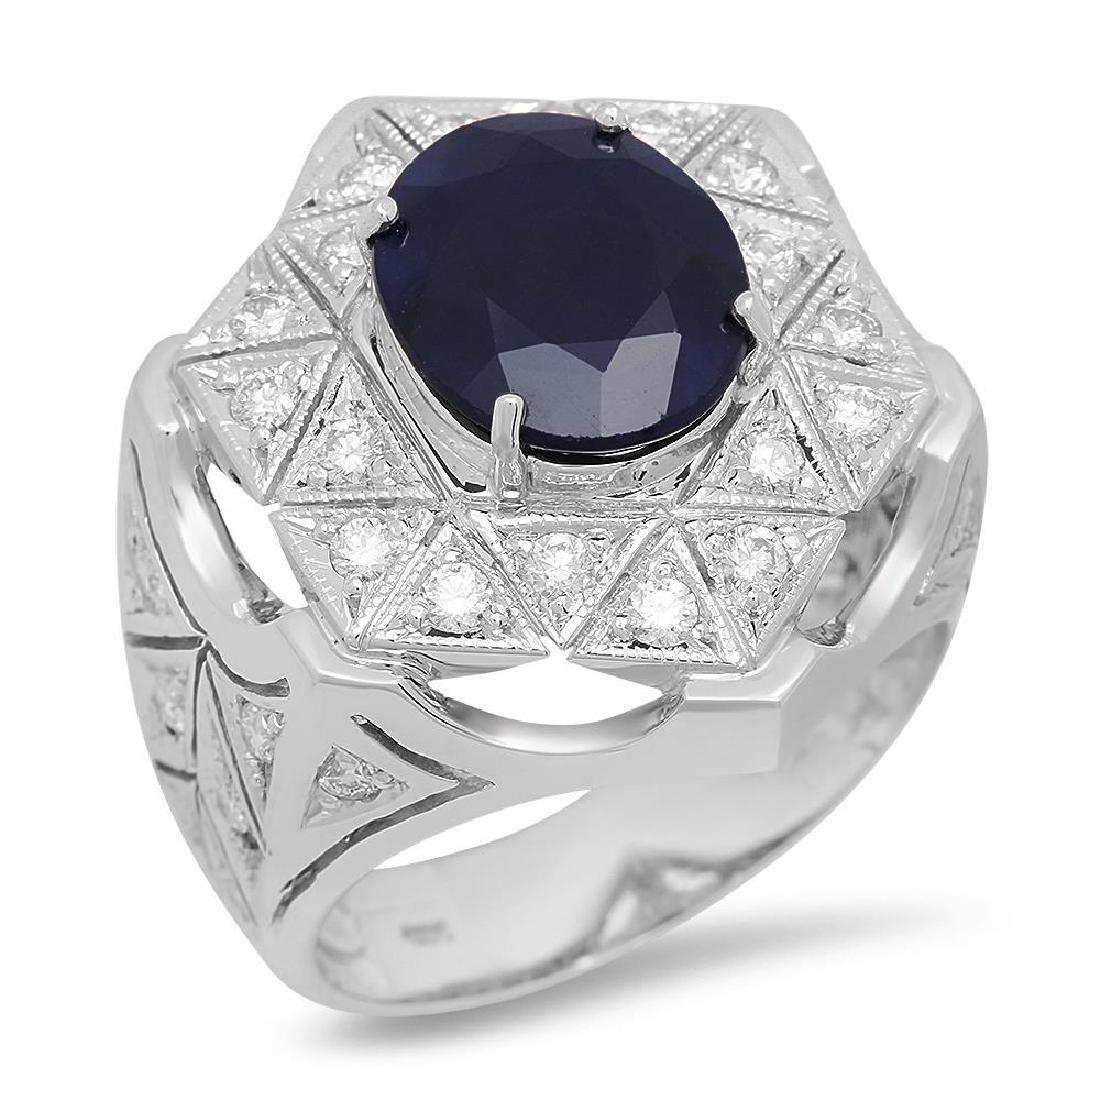 14K Gold 5.01ct Sapphire 1.06cts Diamond Ring